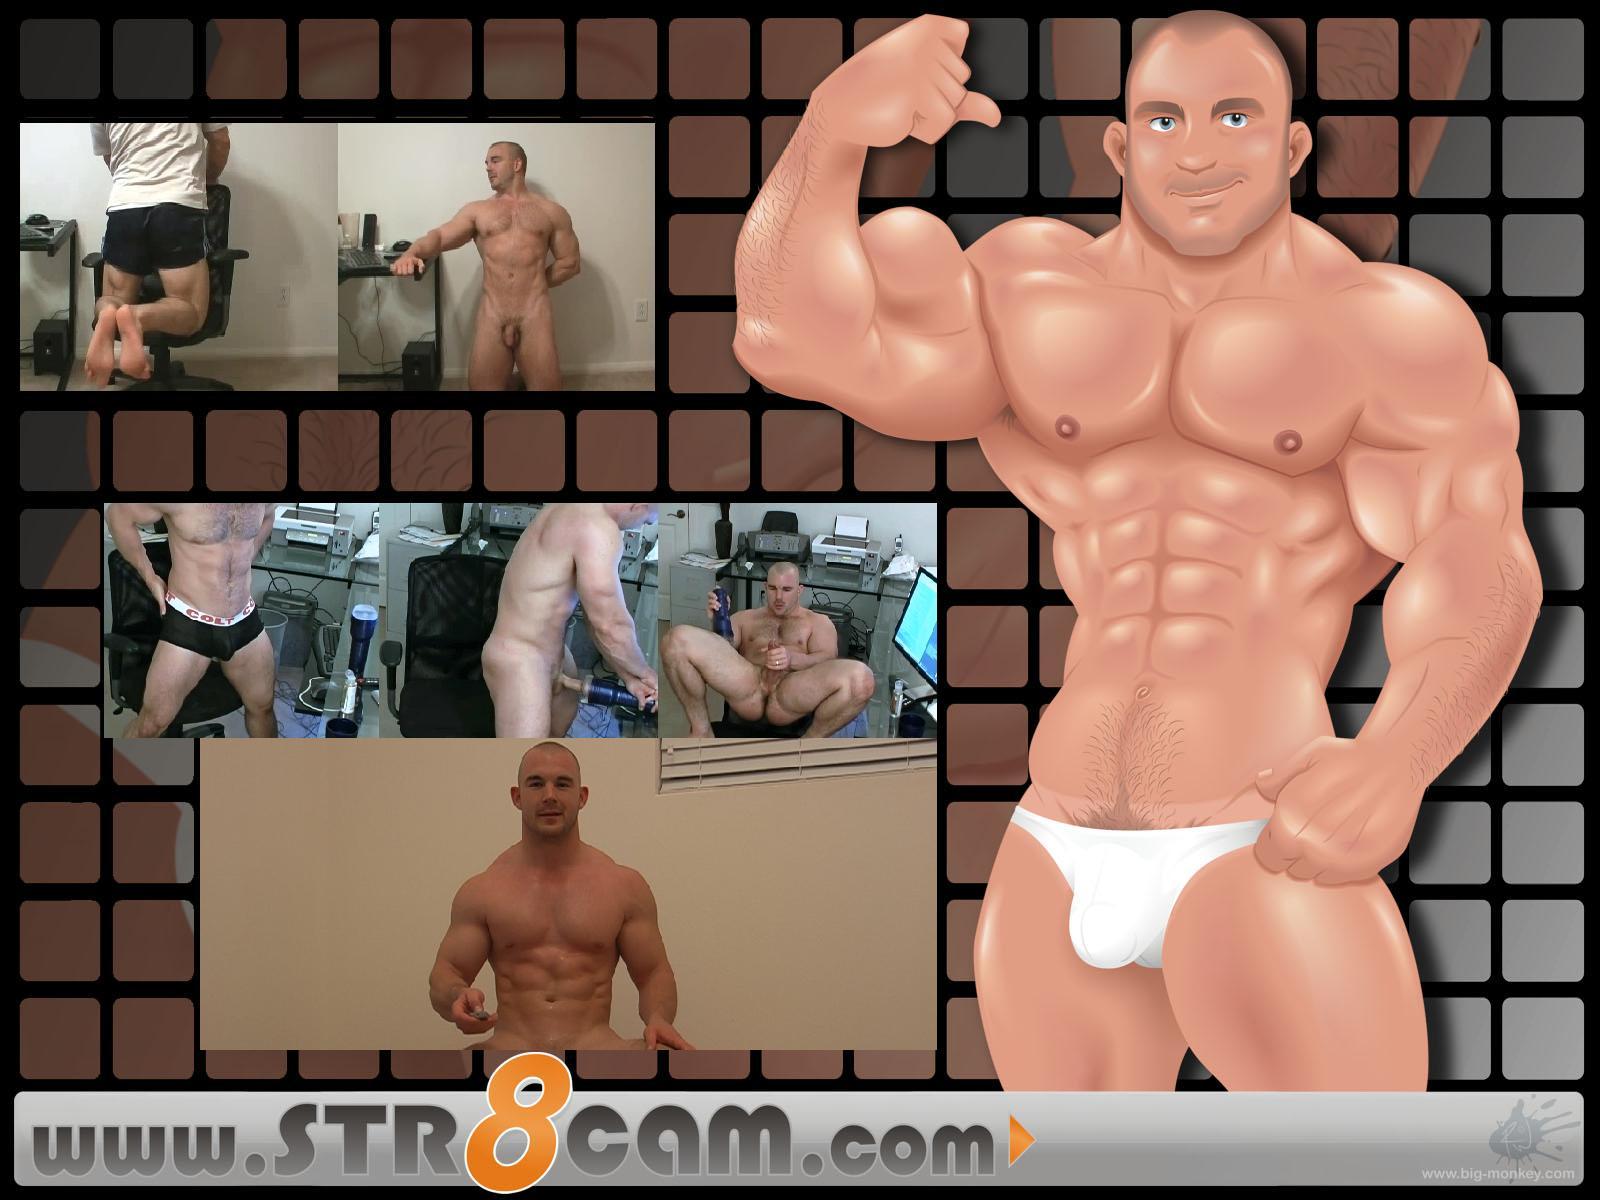 http://3.bp.blogspot.com/_FSVTydO8sOM/TCWwm-o4eAI/AAAAAAAAFOs/cS4kaibyeZA/s1600/STR8cam%2520wallpaperblackd.jpg